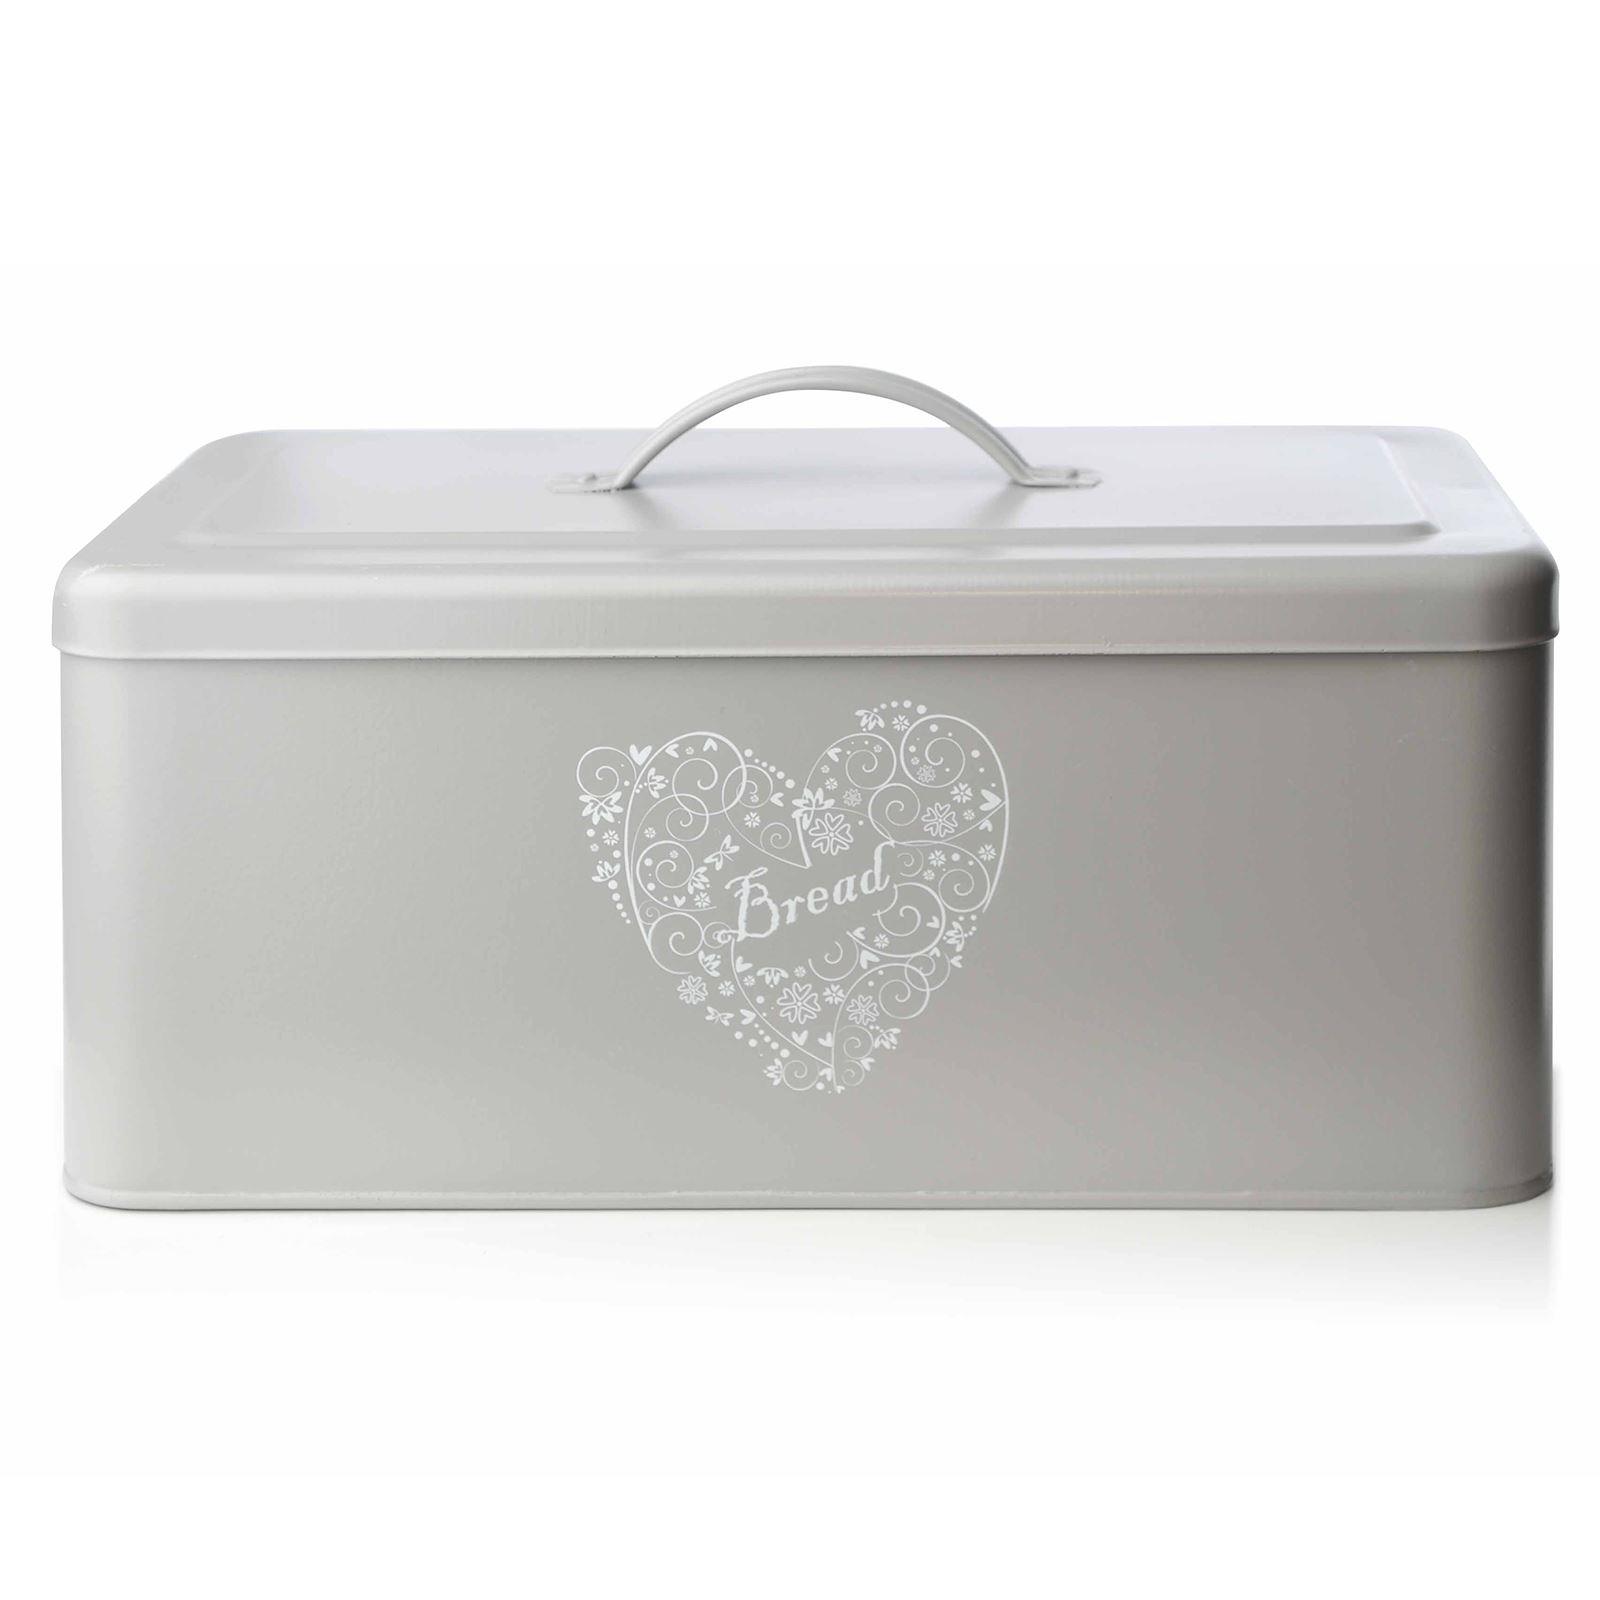 kitchen storage boxes cheap used appliances bread holder bin box vintage design home